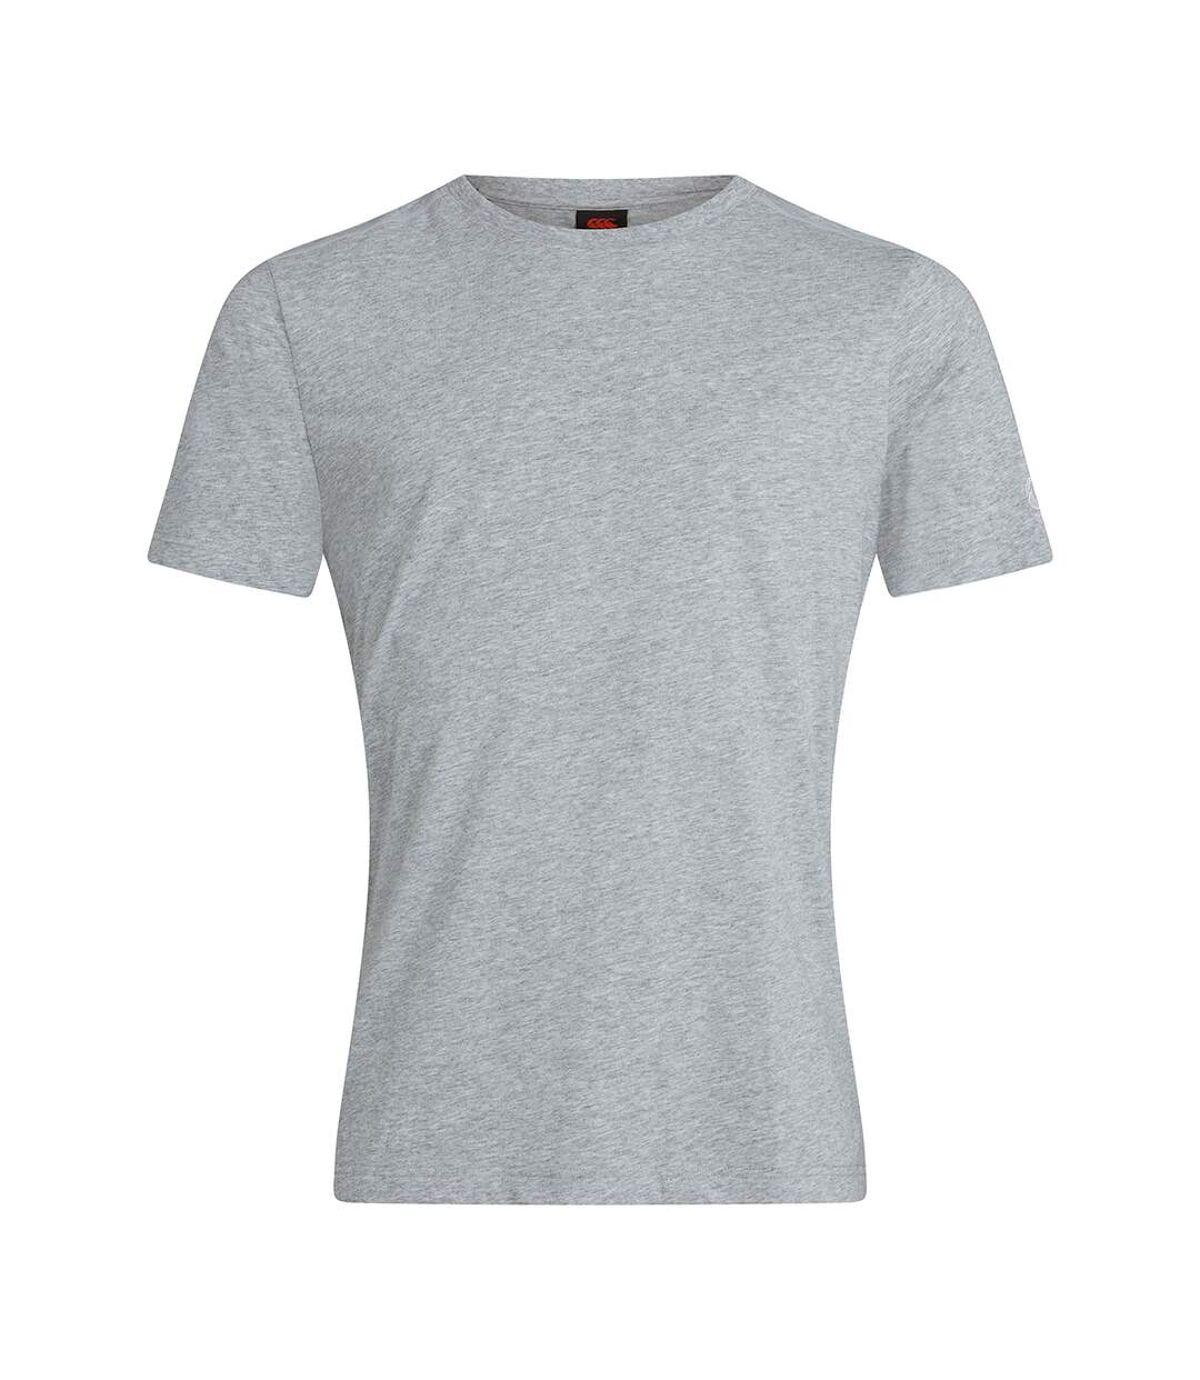 Canterbury Unisex Adult Club Plain T-Shirt (Grey Marl) - UTPC4372